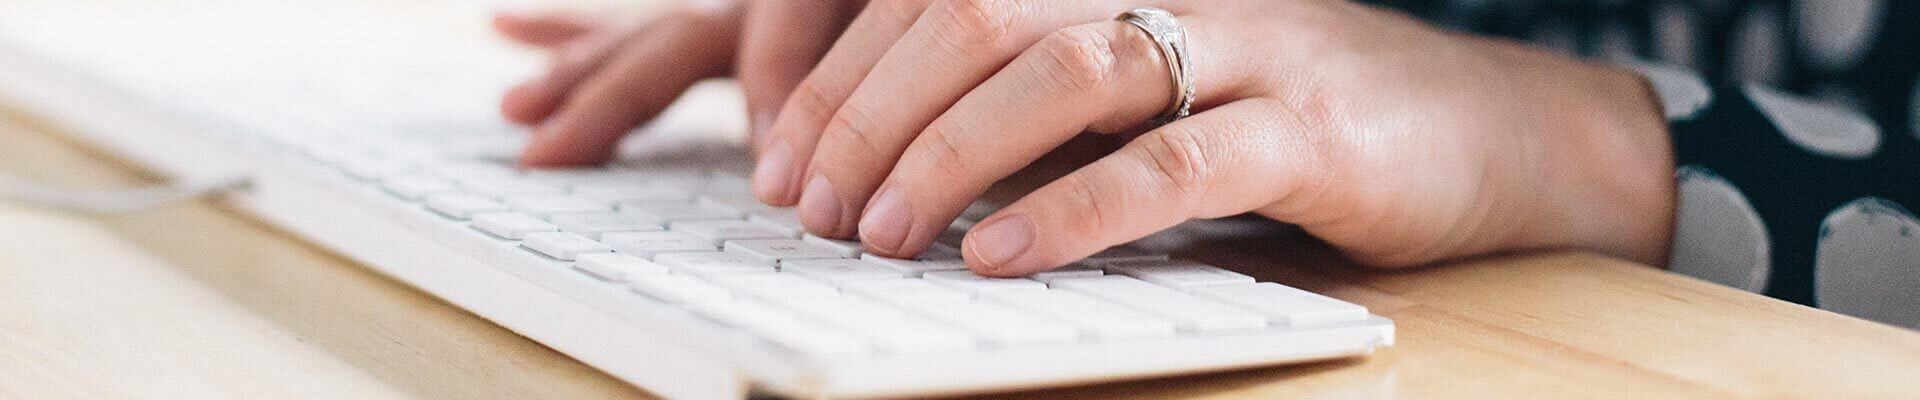 Клавиатура и рерайтер